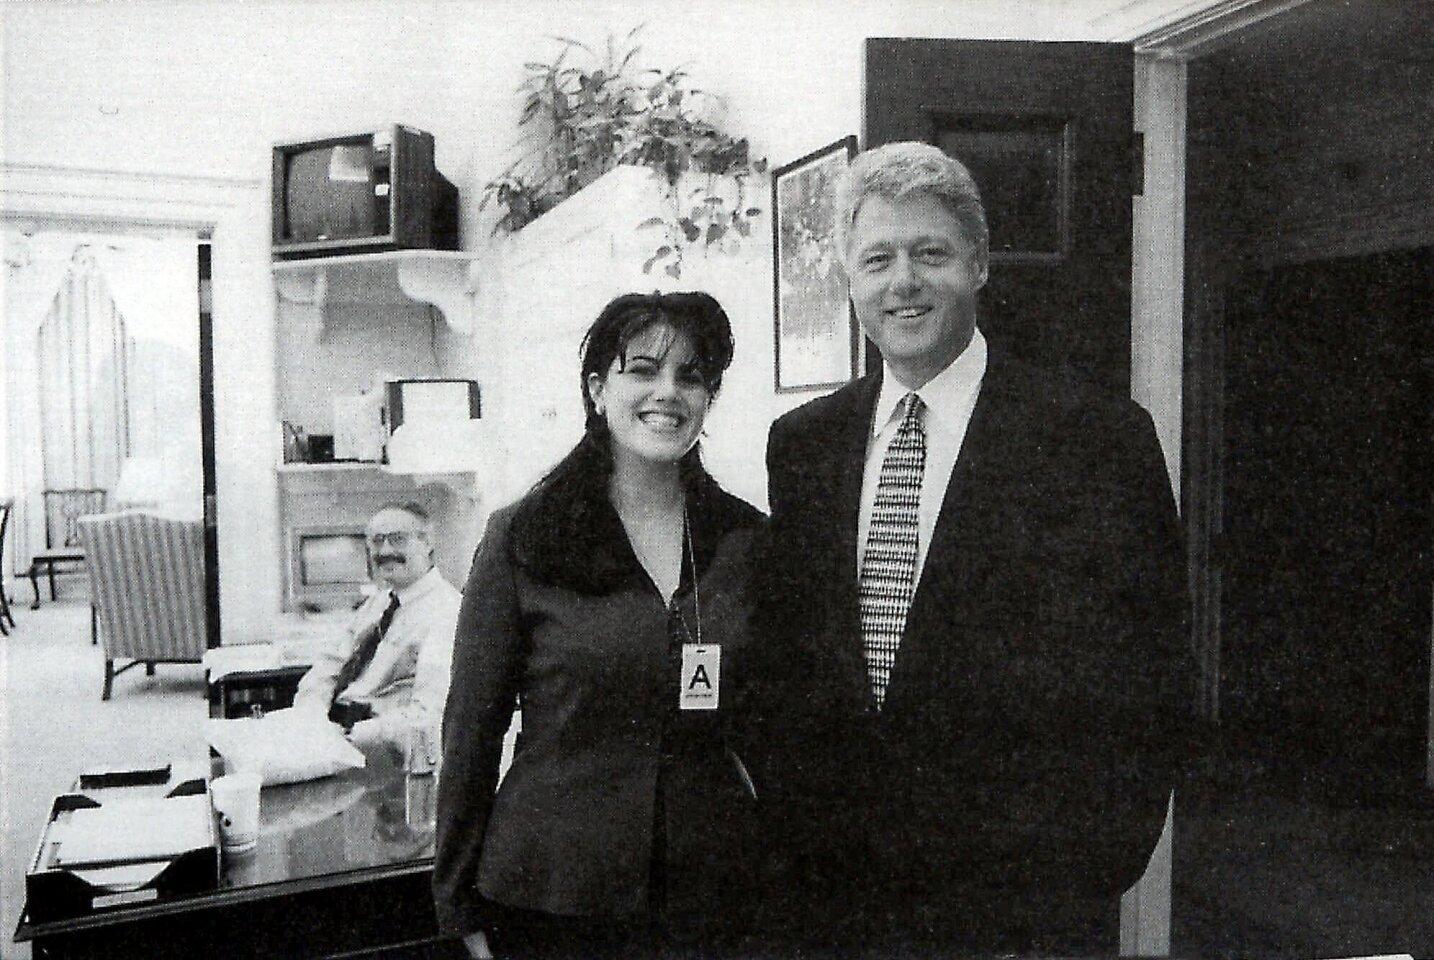 Bill Clinton and Monica Lewinsky  (and Gennifer Flowers and Paula Jones)